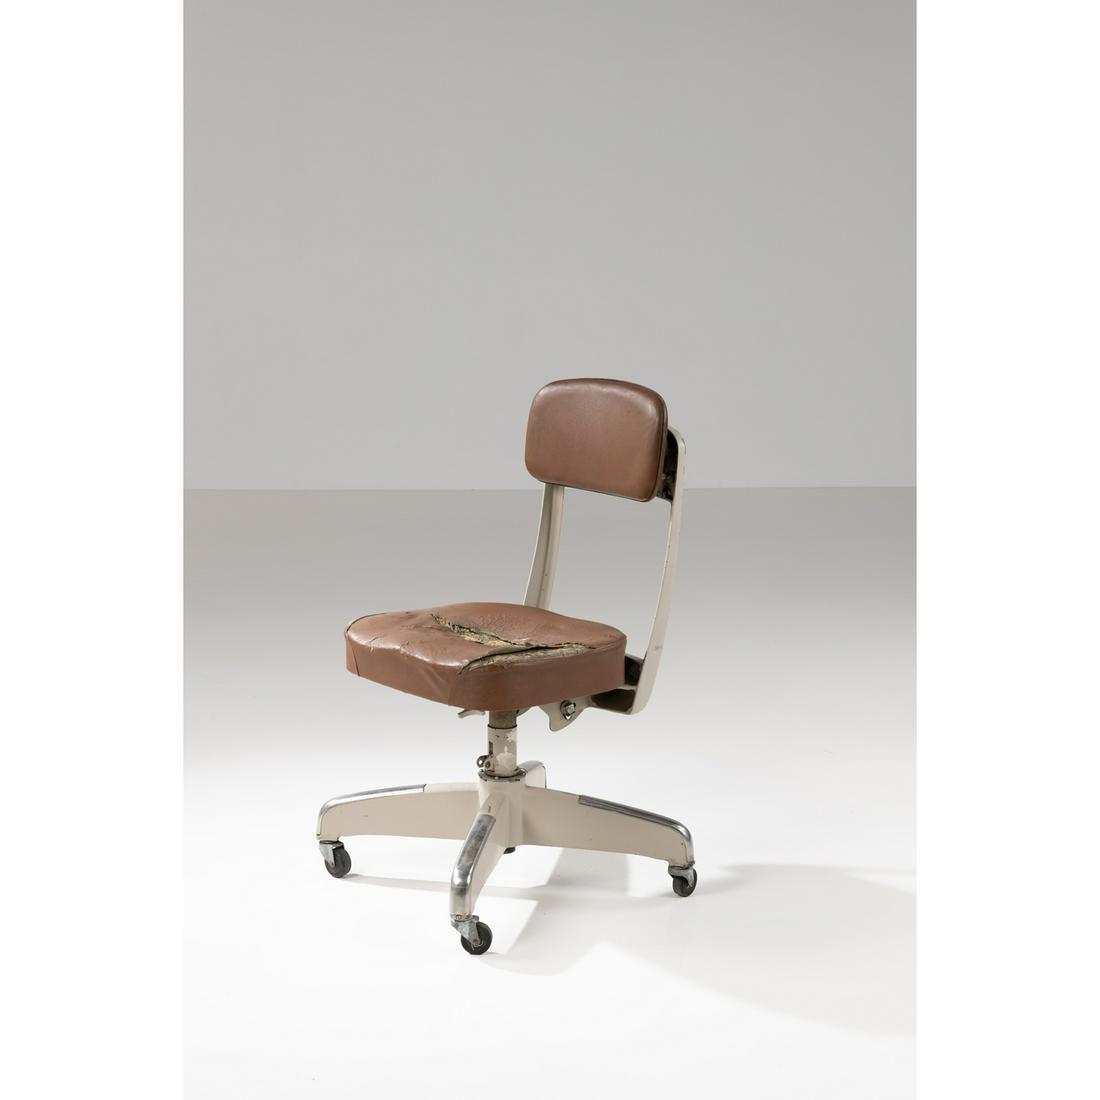 Gio Ponti (1891-1979) Desk armchair